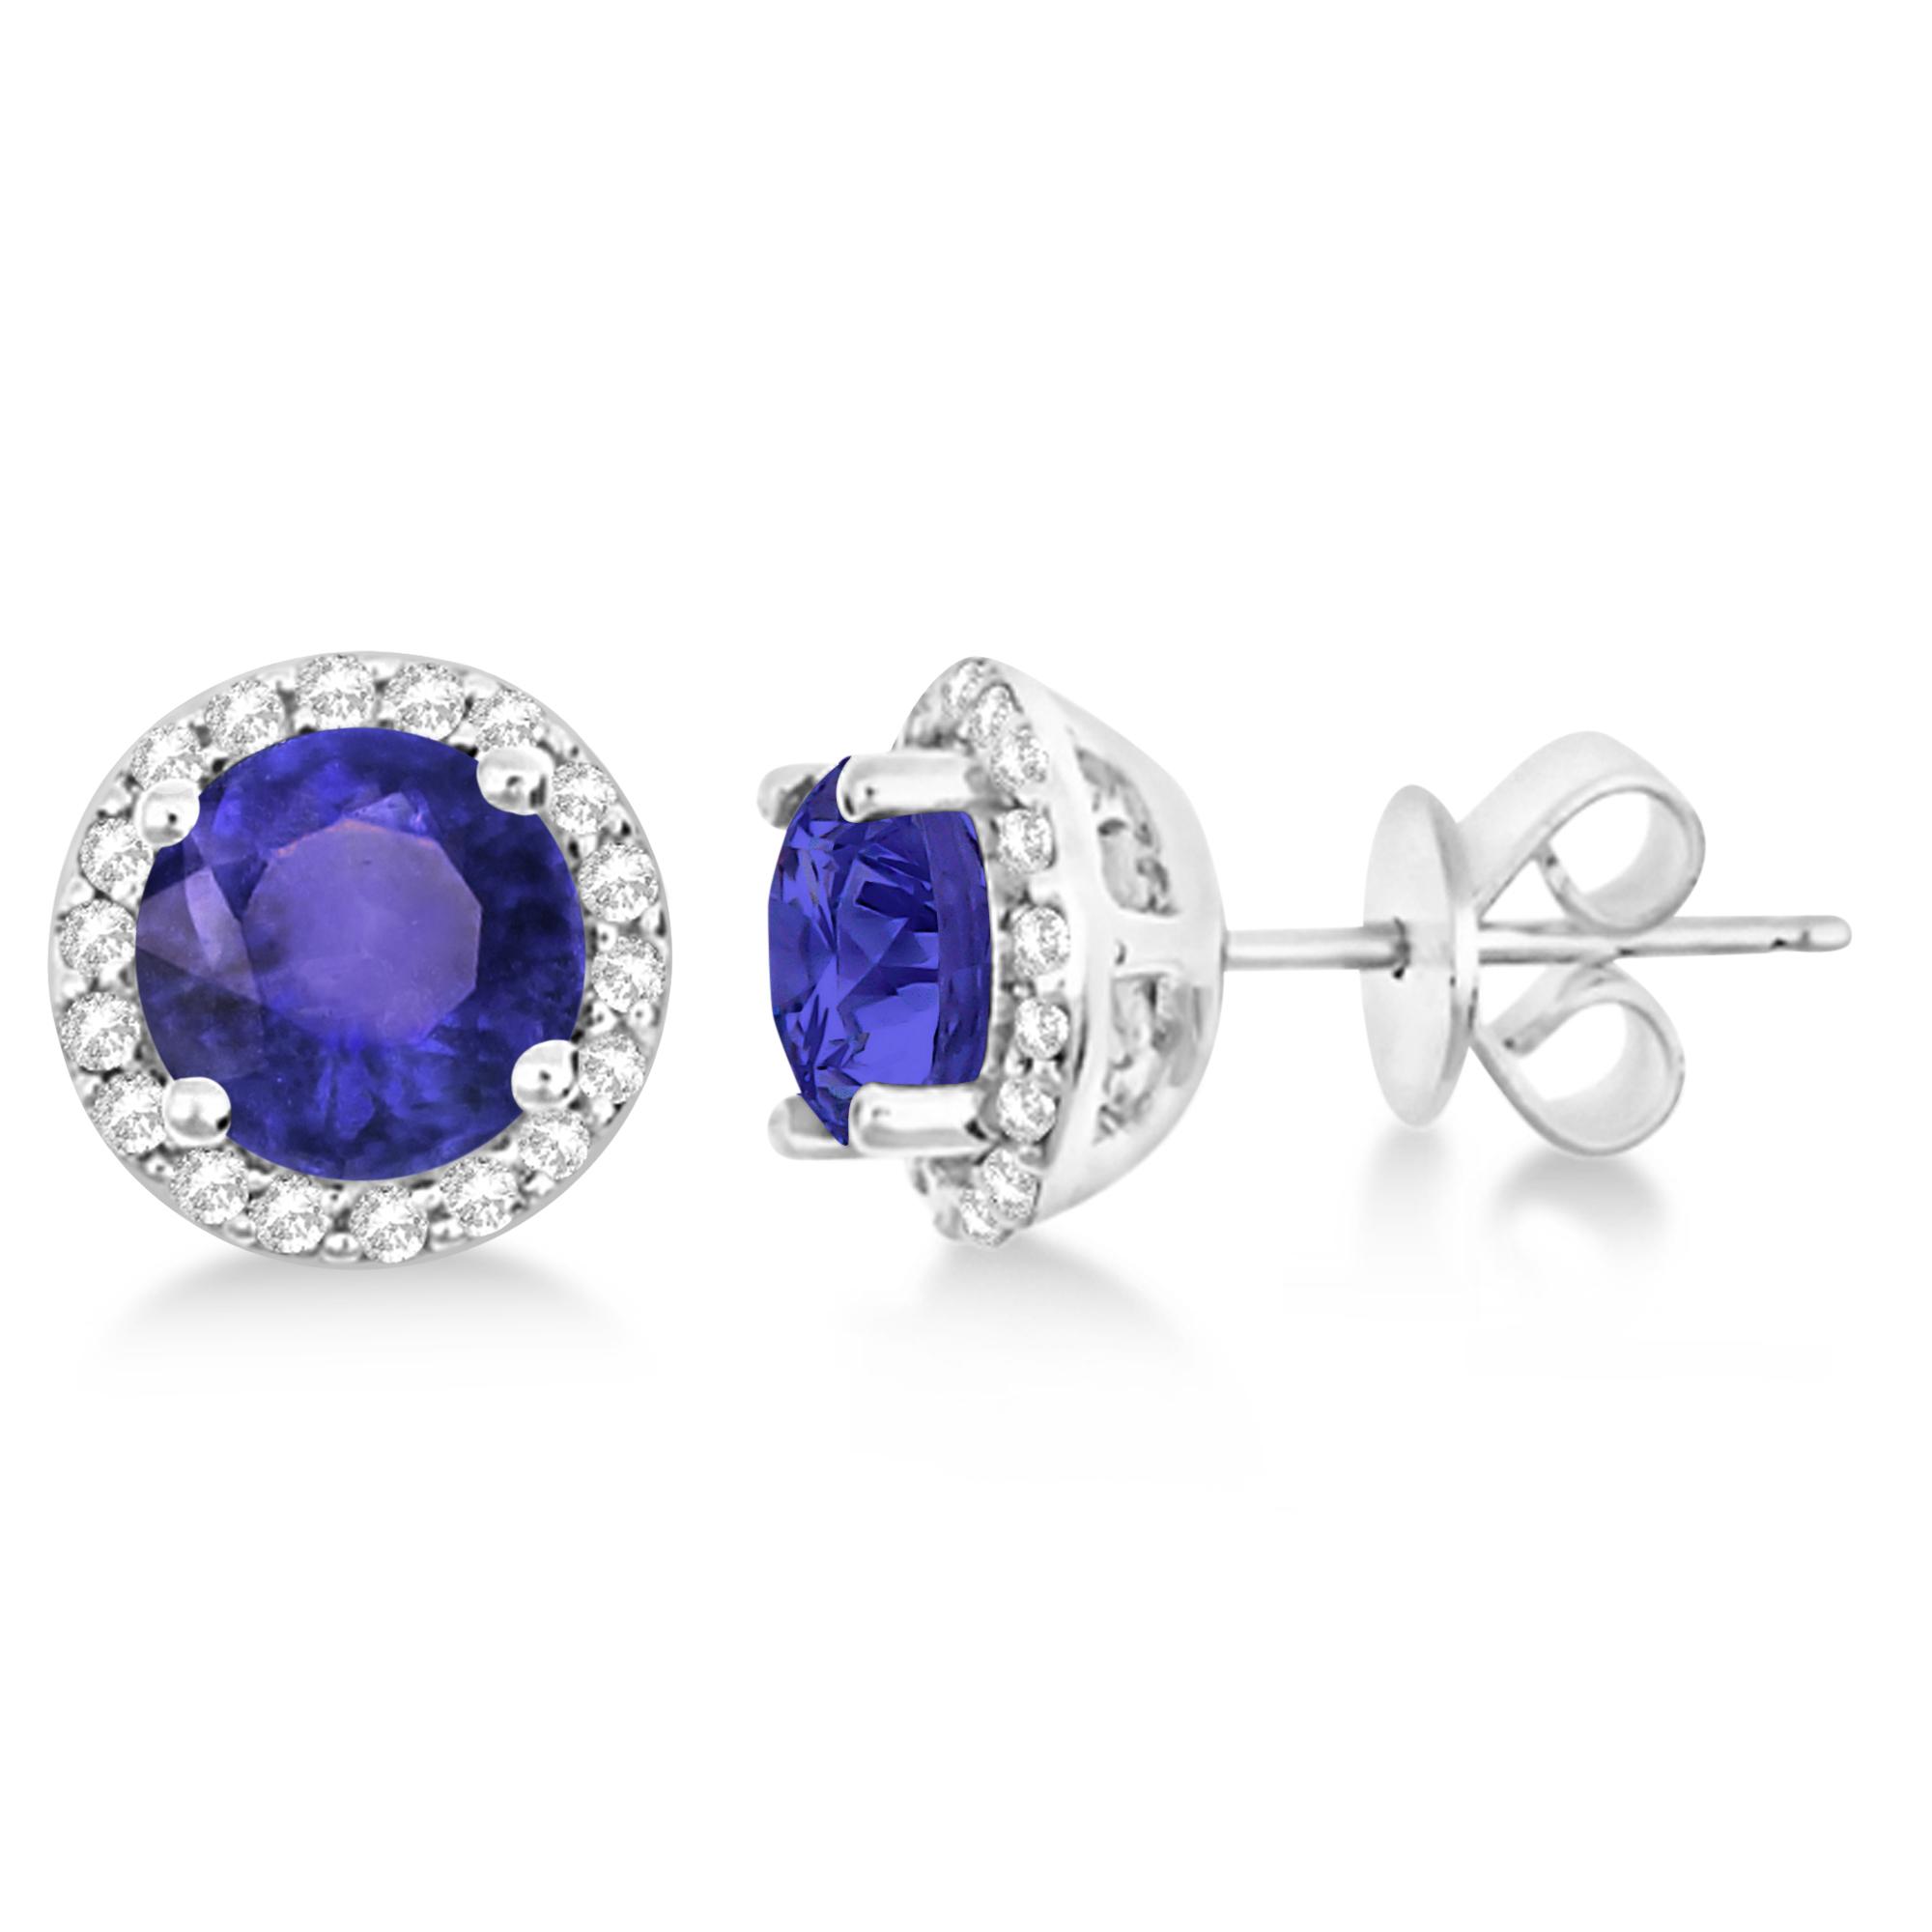 Tanzanite & Diamond Halo Stud Earrings in Sterling Silver 2.27ct